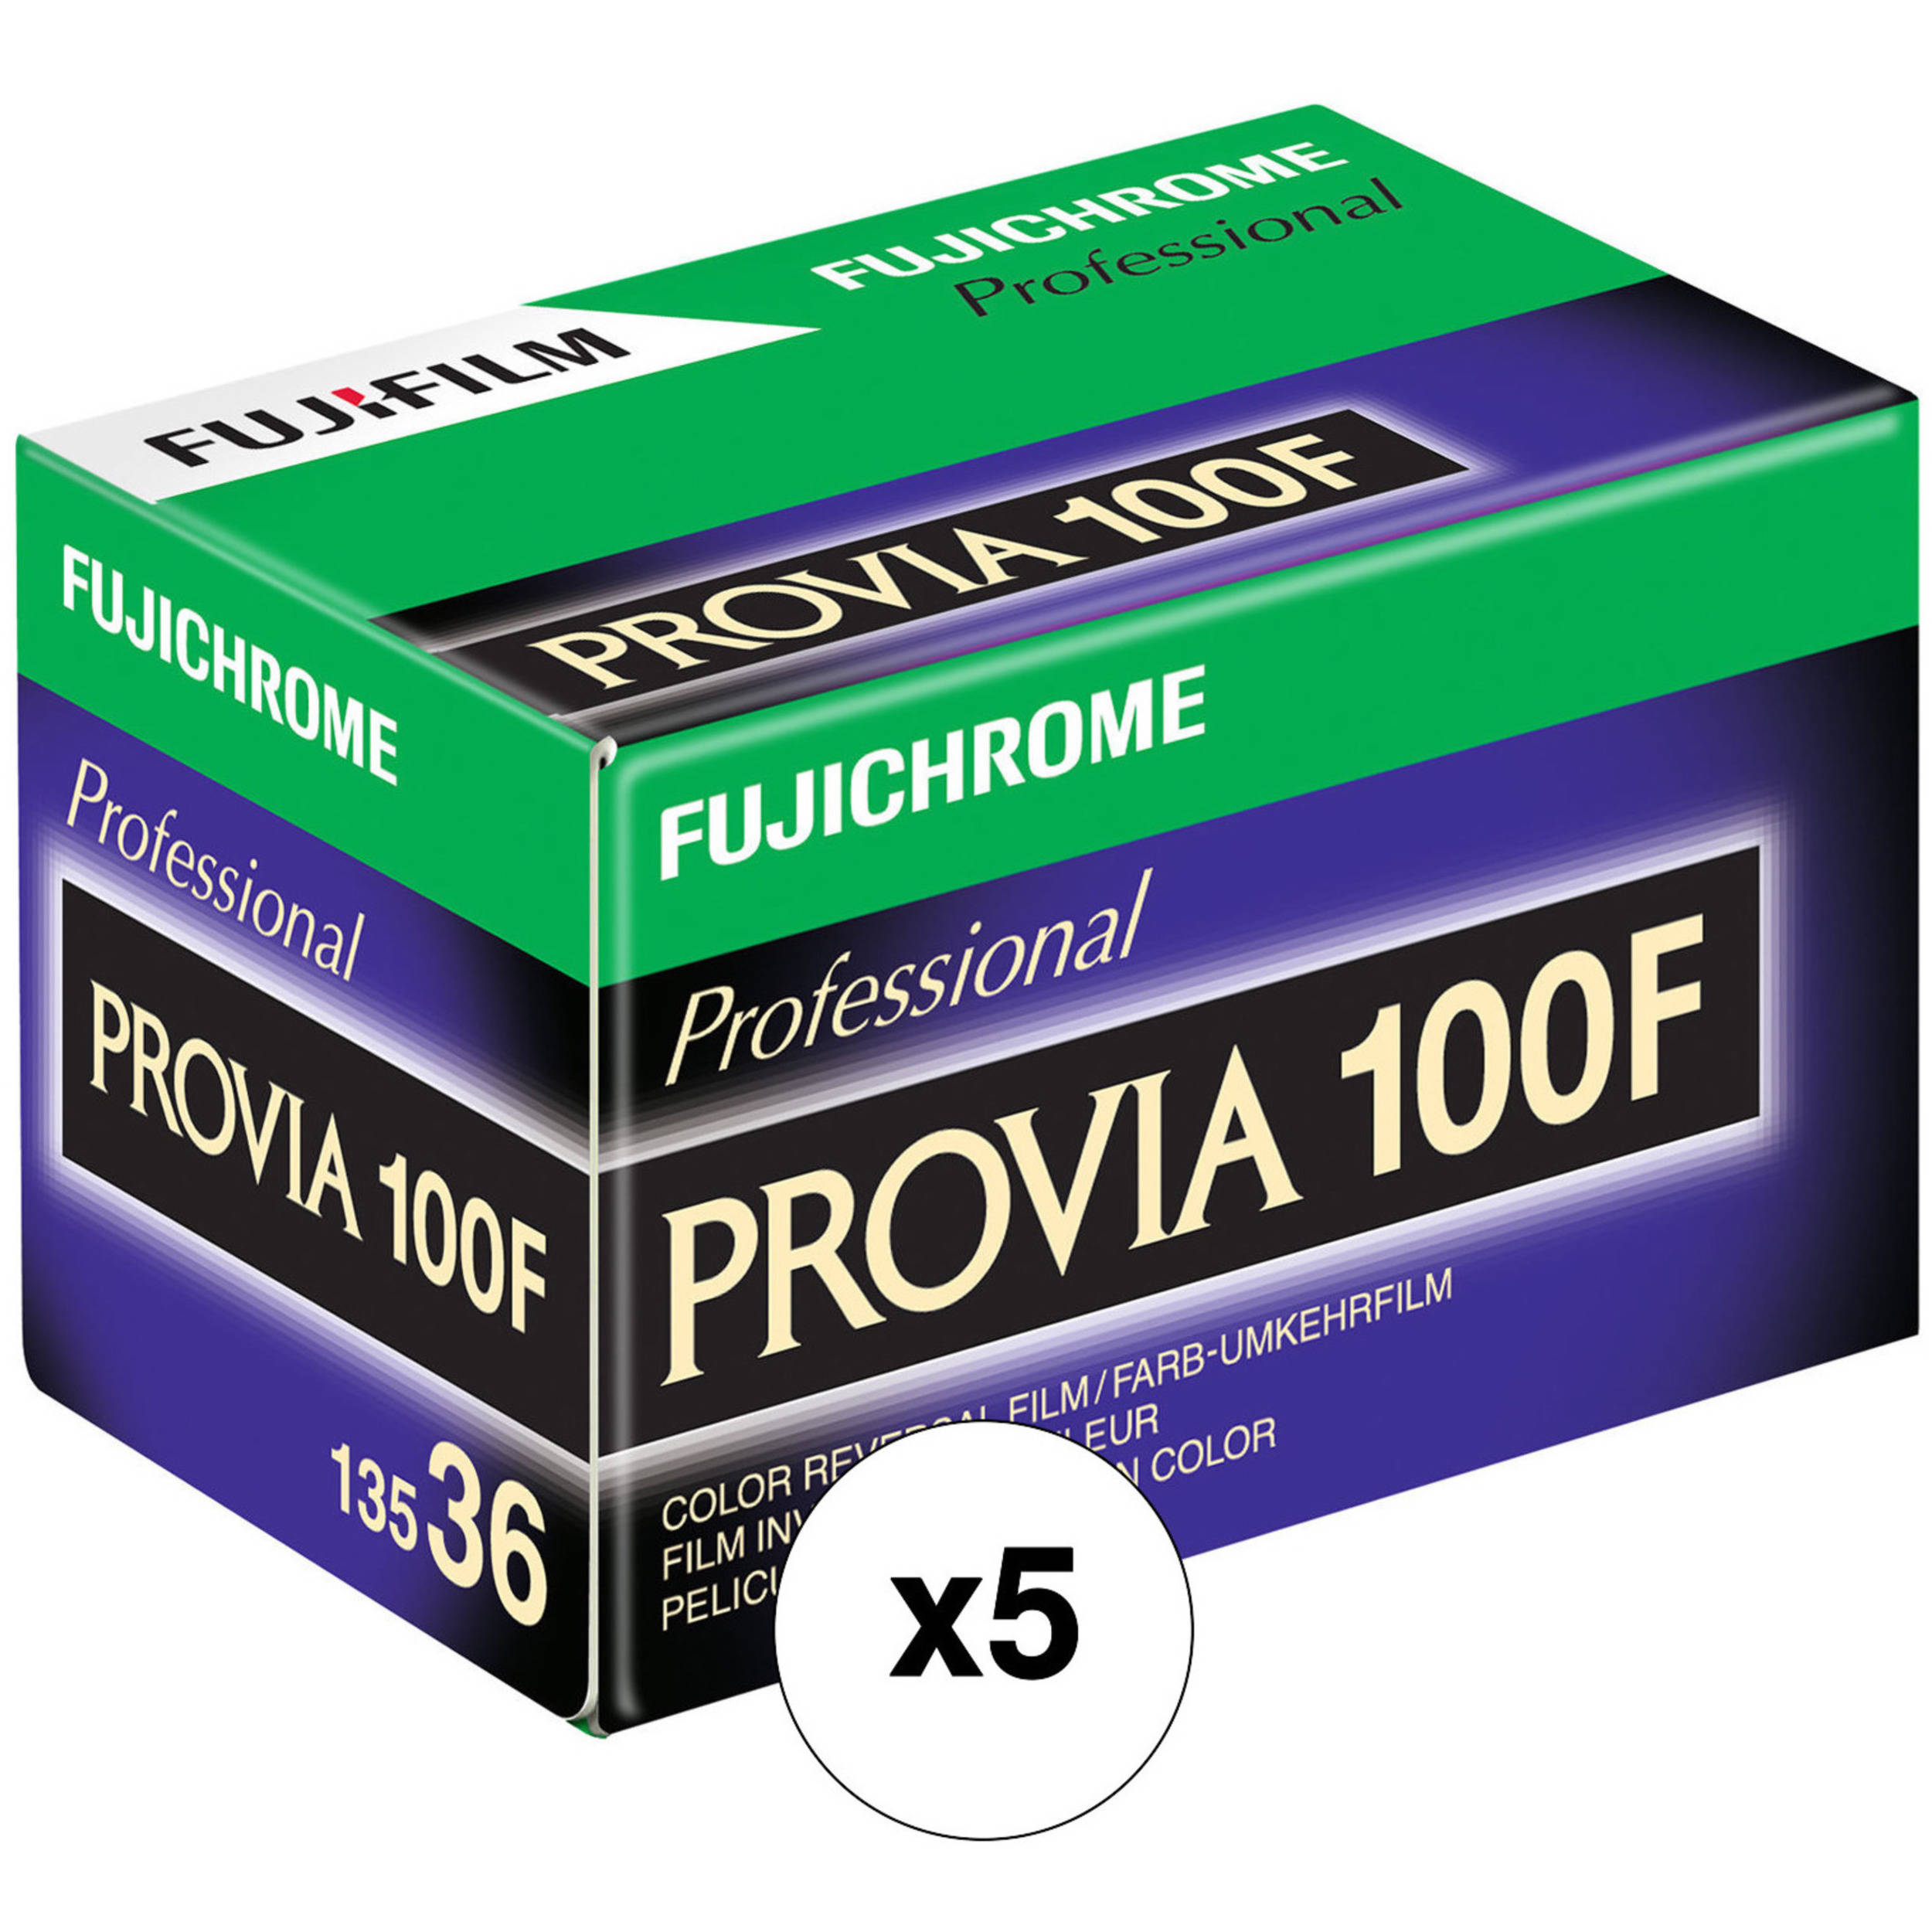 Fujifilm fujichrome provia 100f professional rdp iii 16326030 for What is provia